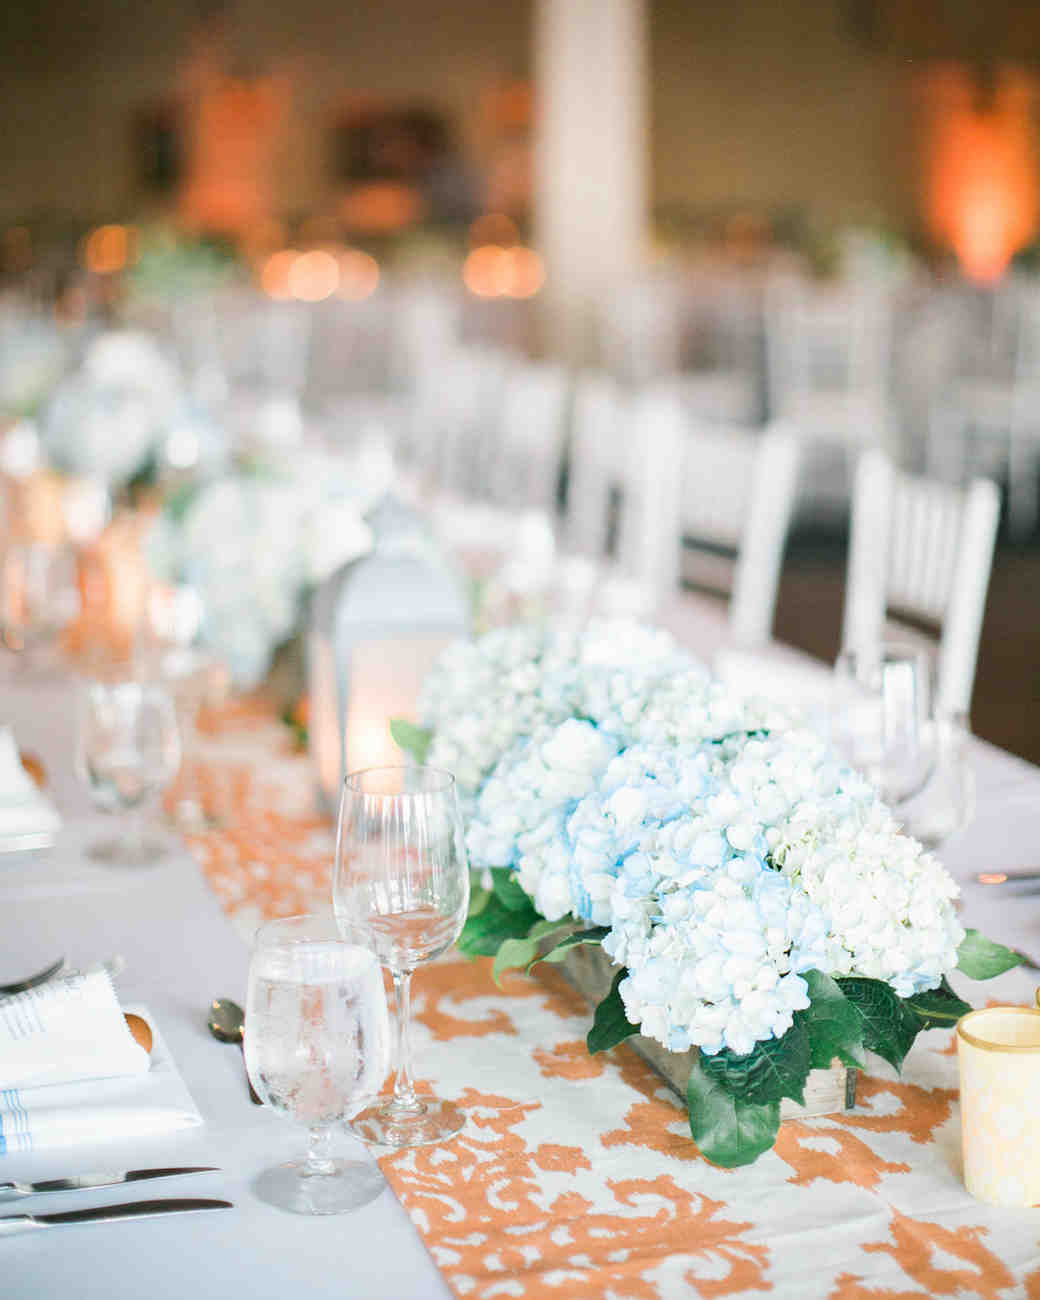 36 simple wedding centerpieces martha stewart weddings rh marthastewartweddings com Wedding Reception Table Decorations simple candle centerpieces wedding reception